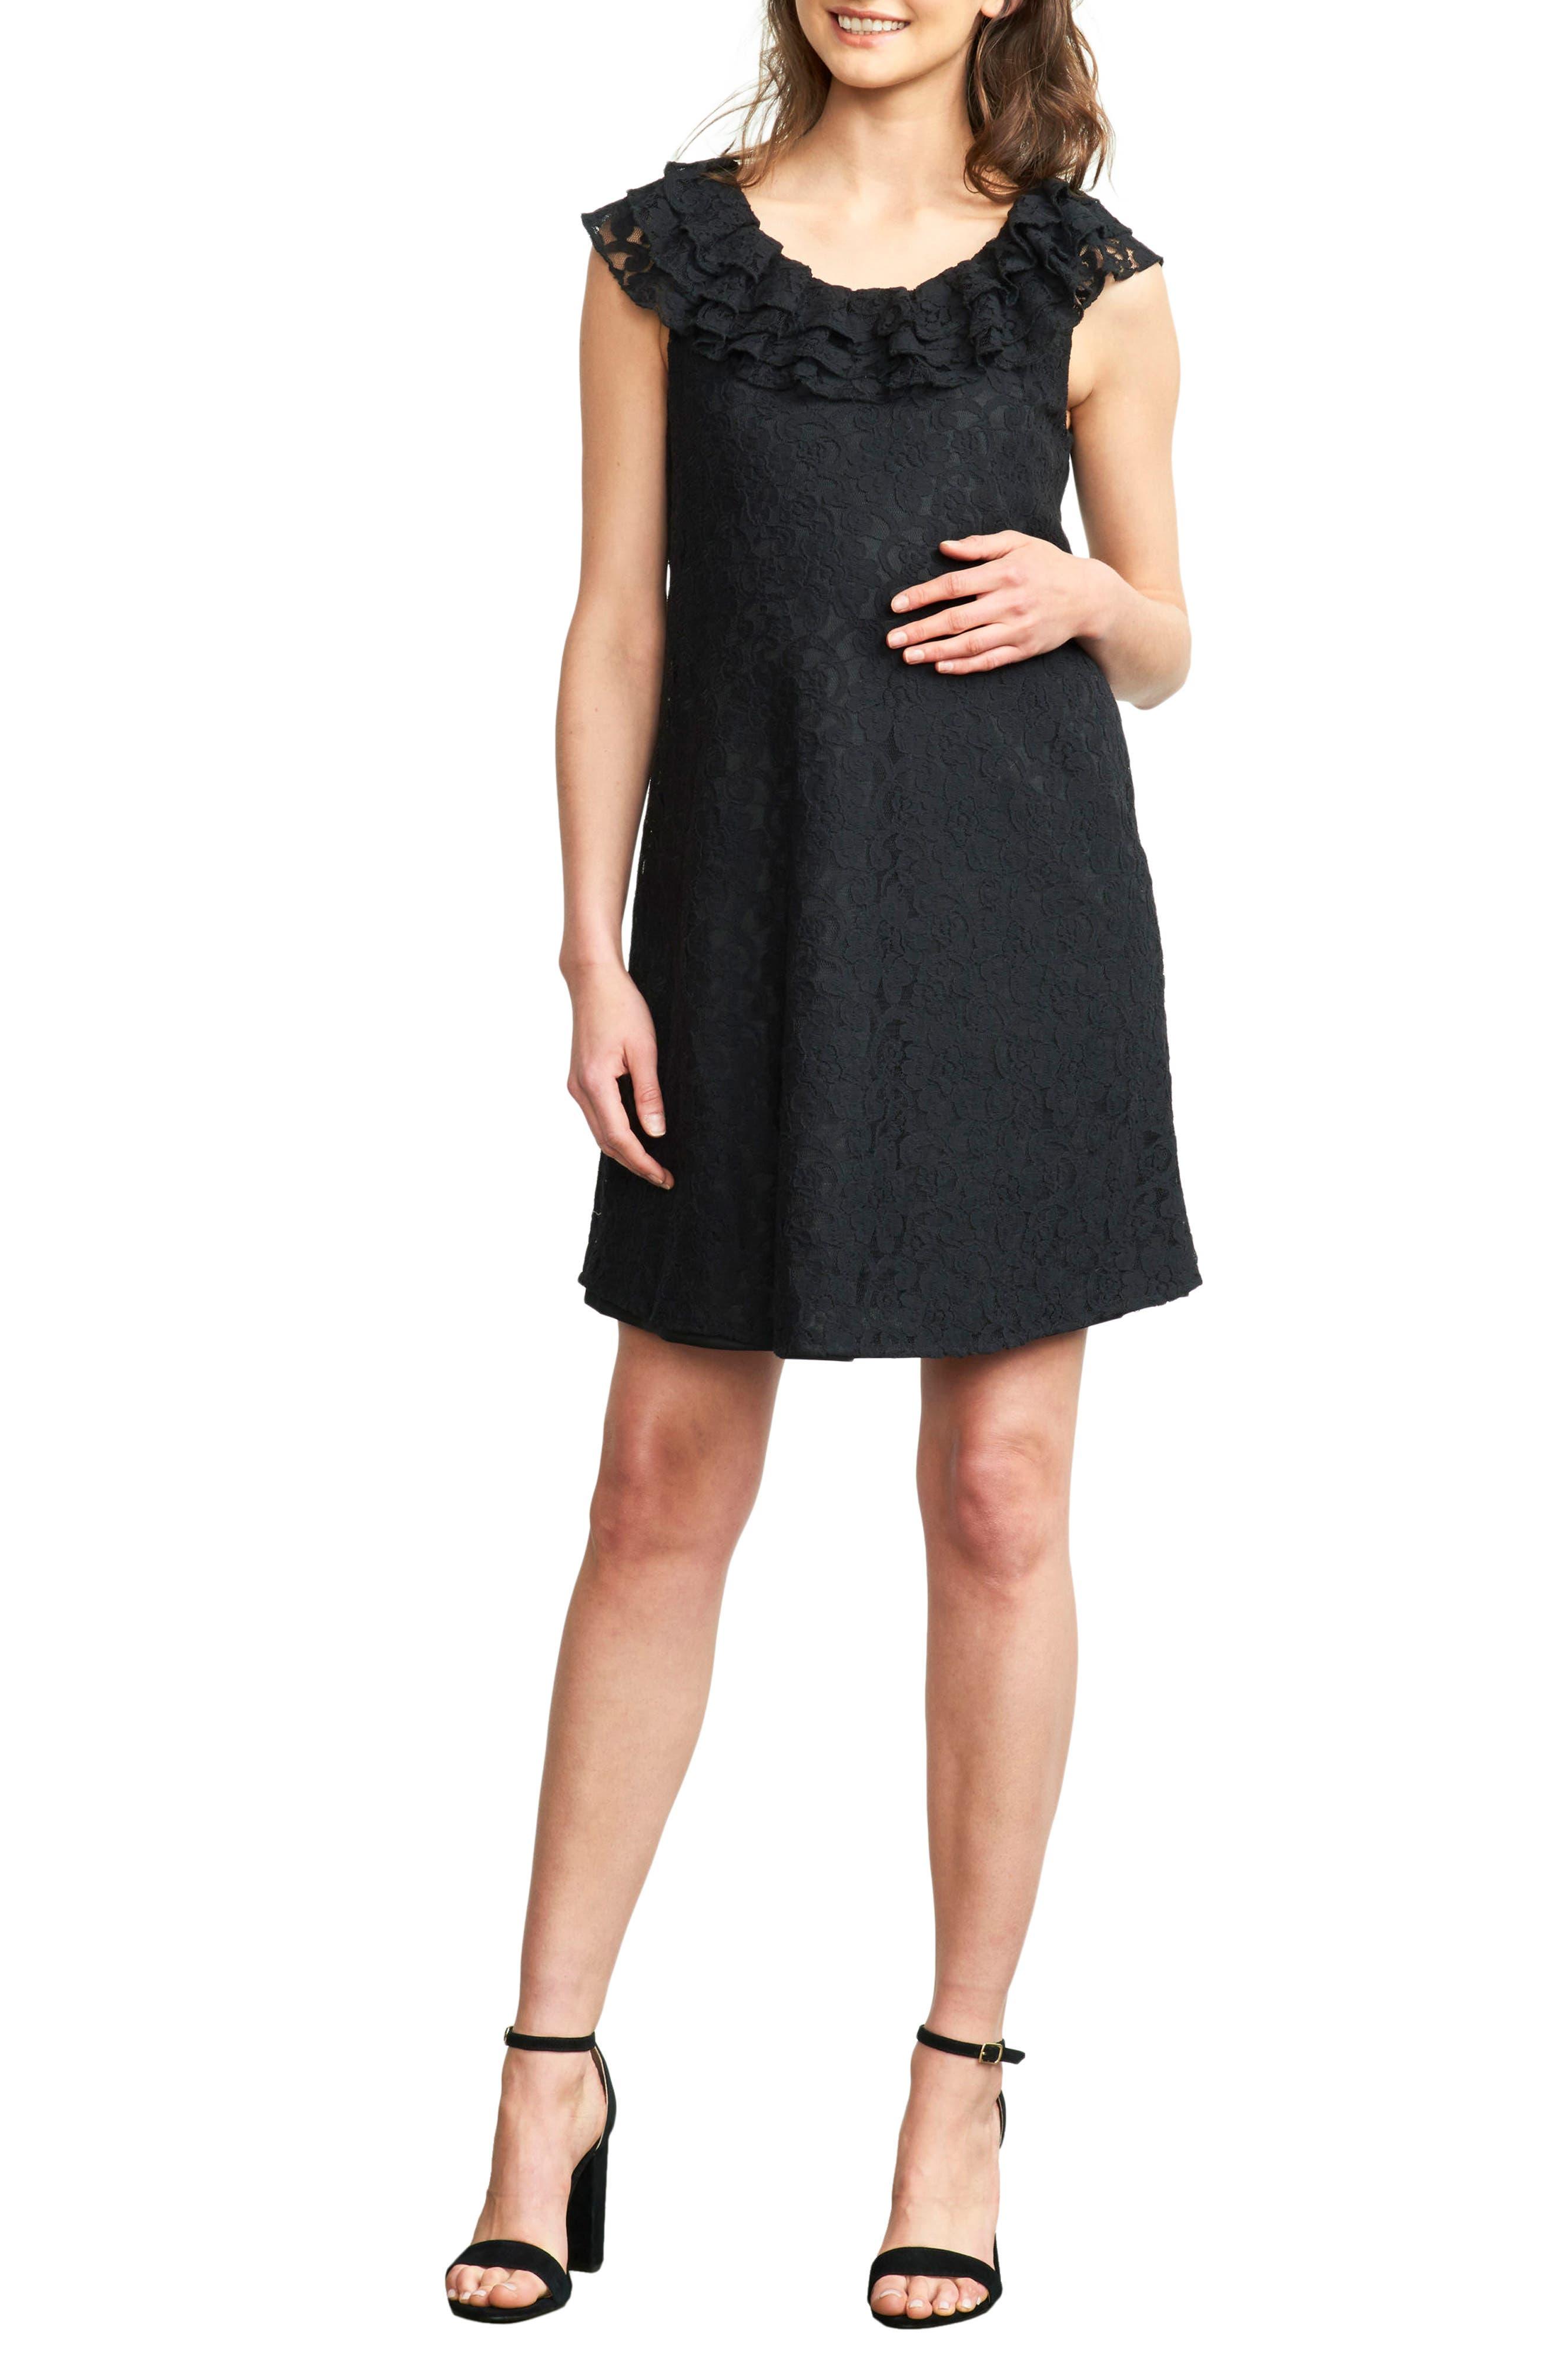 Ruffled Maternity Dress,                         Main,                         color, Black Lace